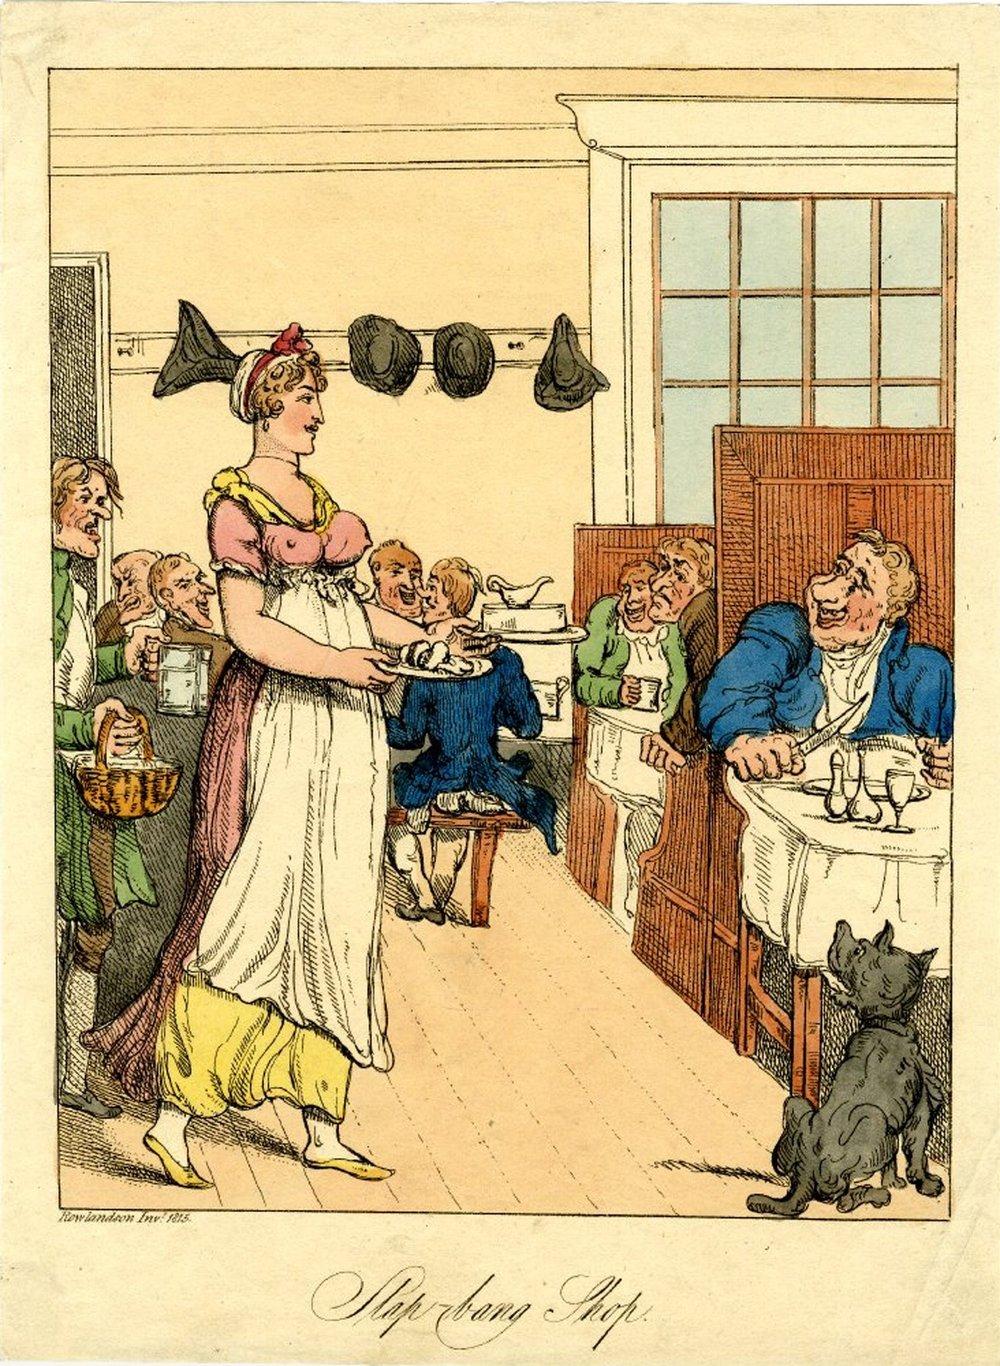 The Slap-Bang Shop, Rowlandson (1815)